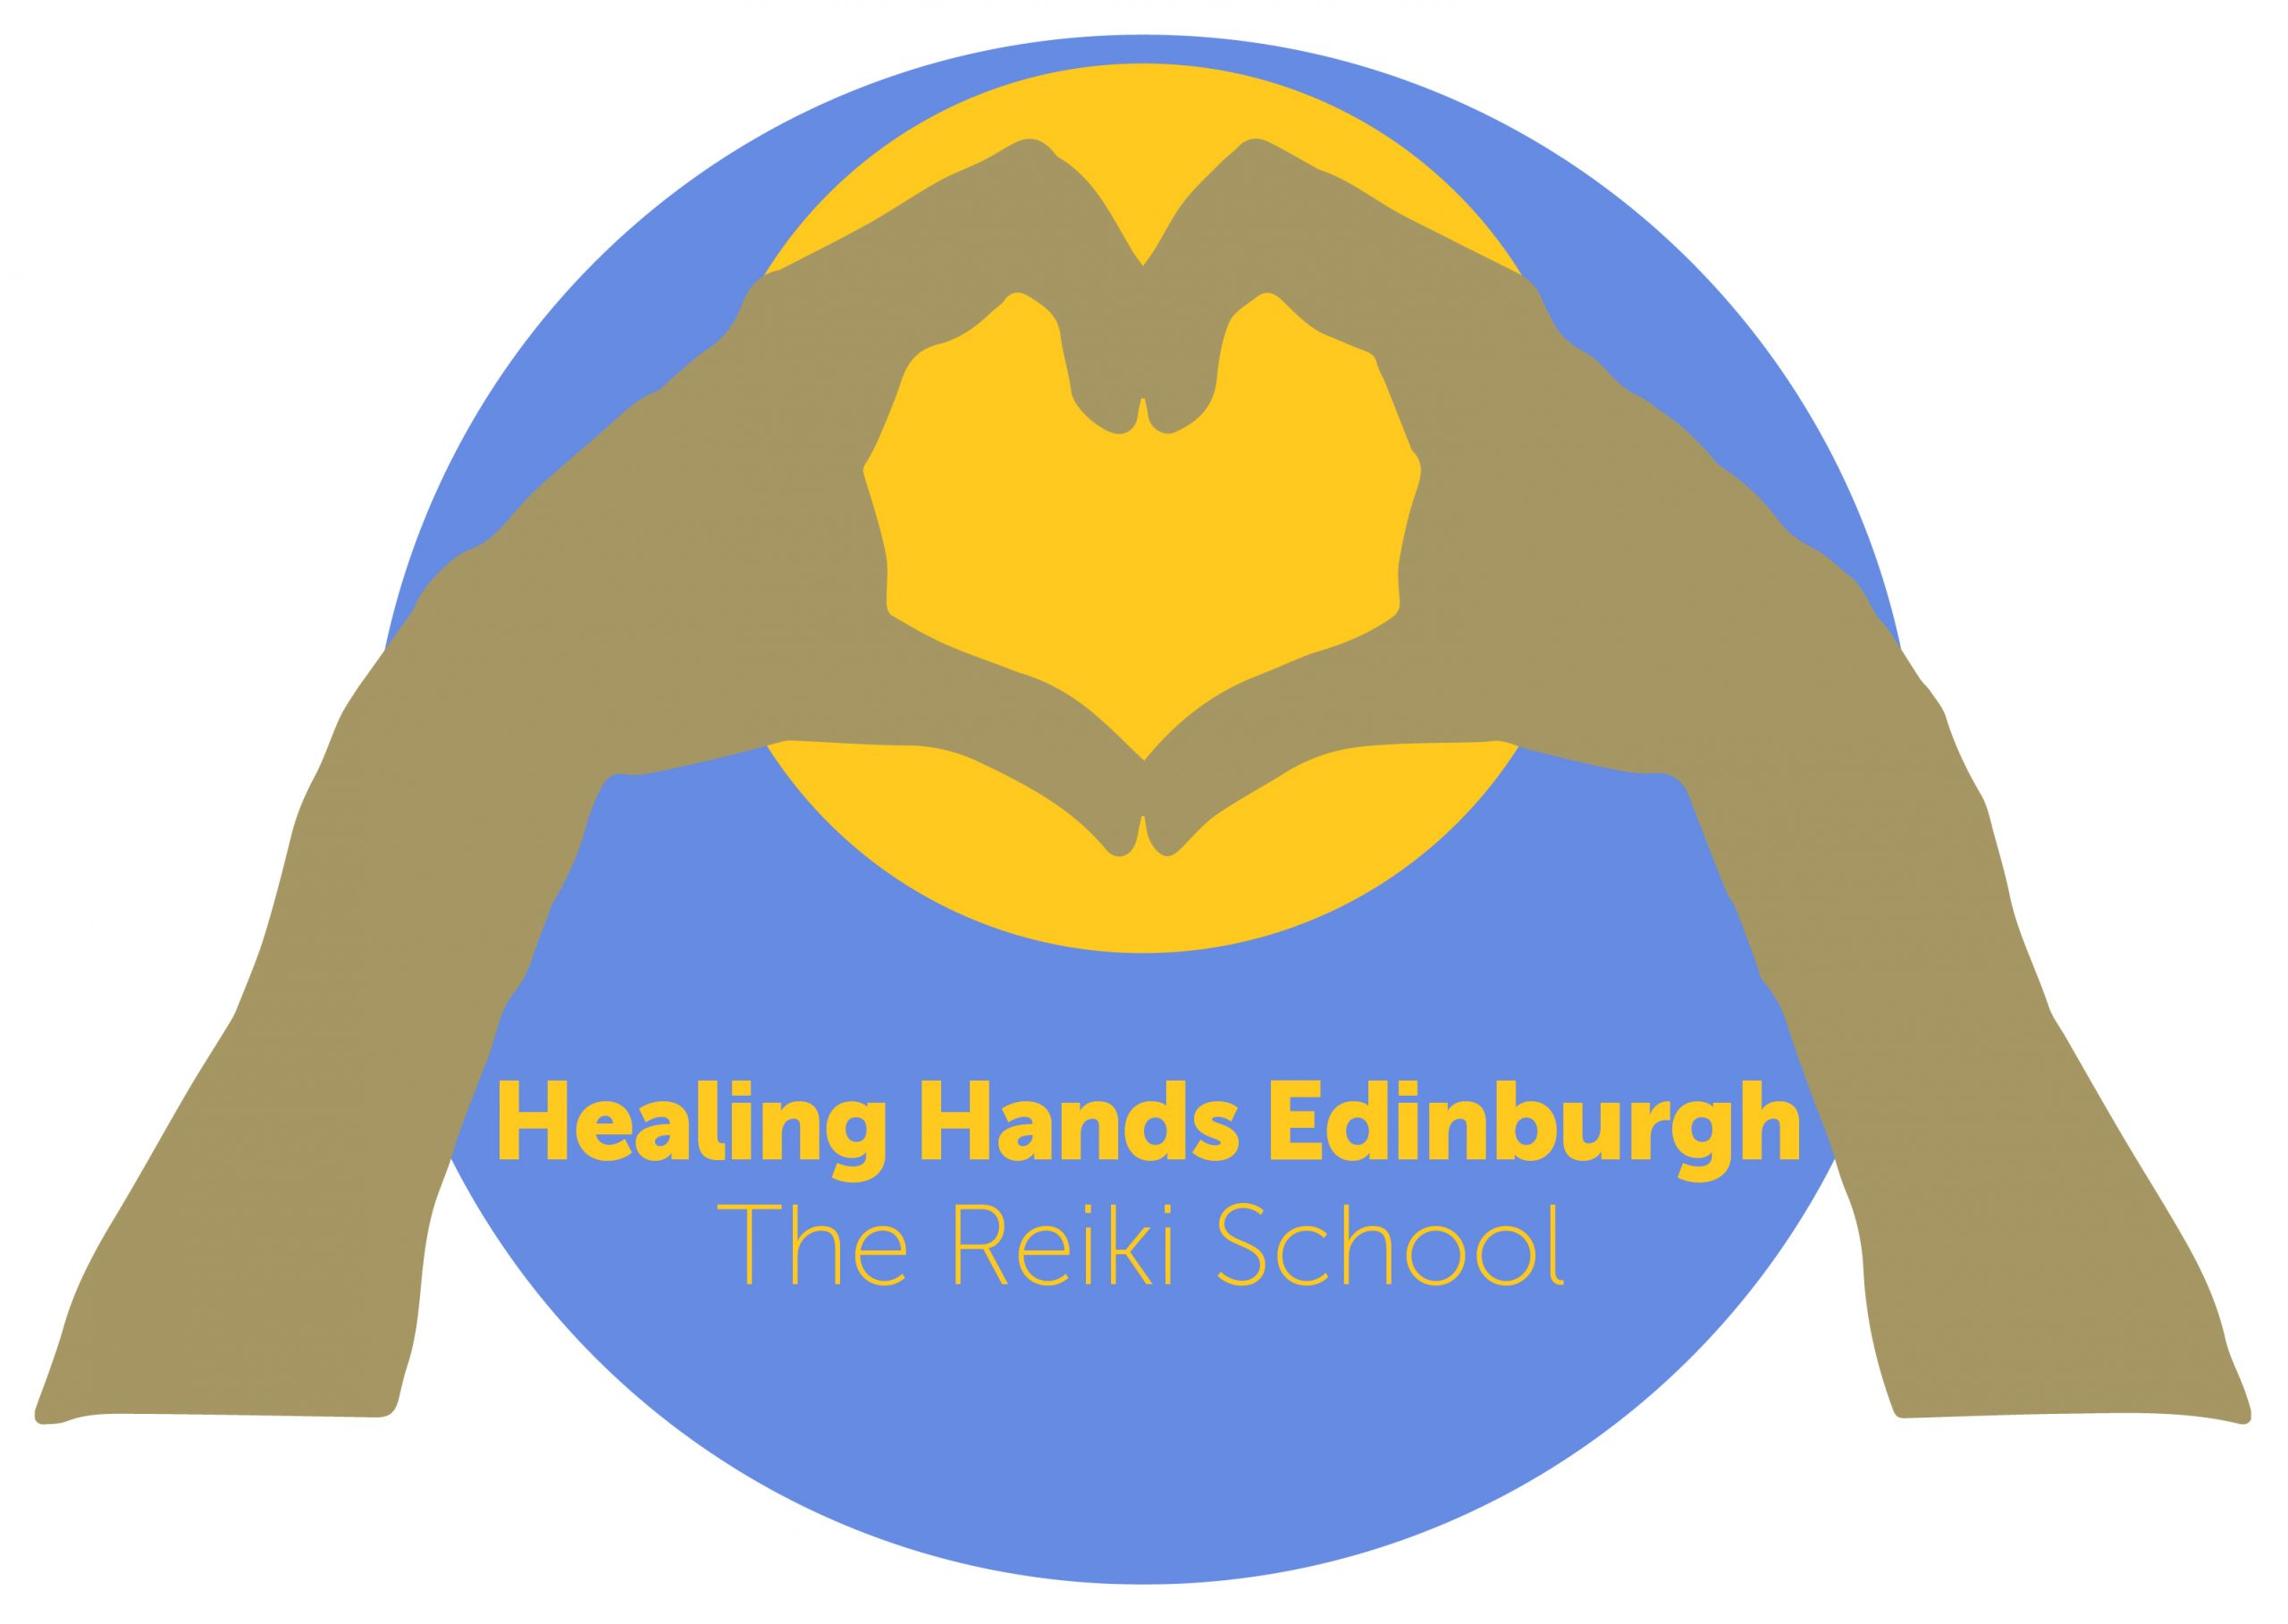 Healing Hands Edinburgh Reiki School